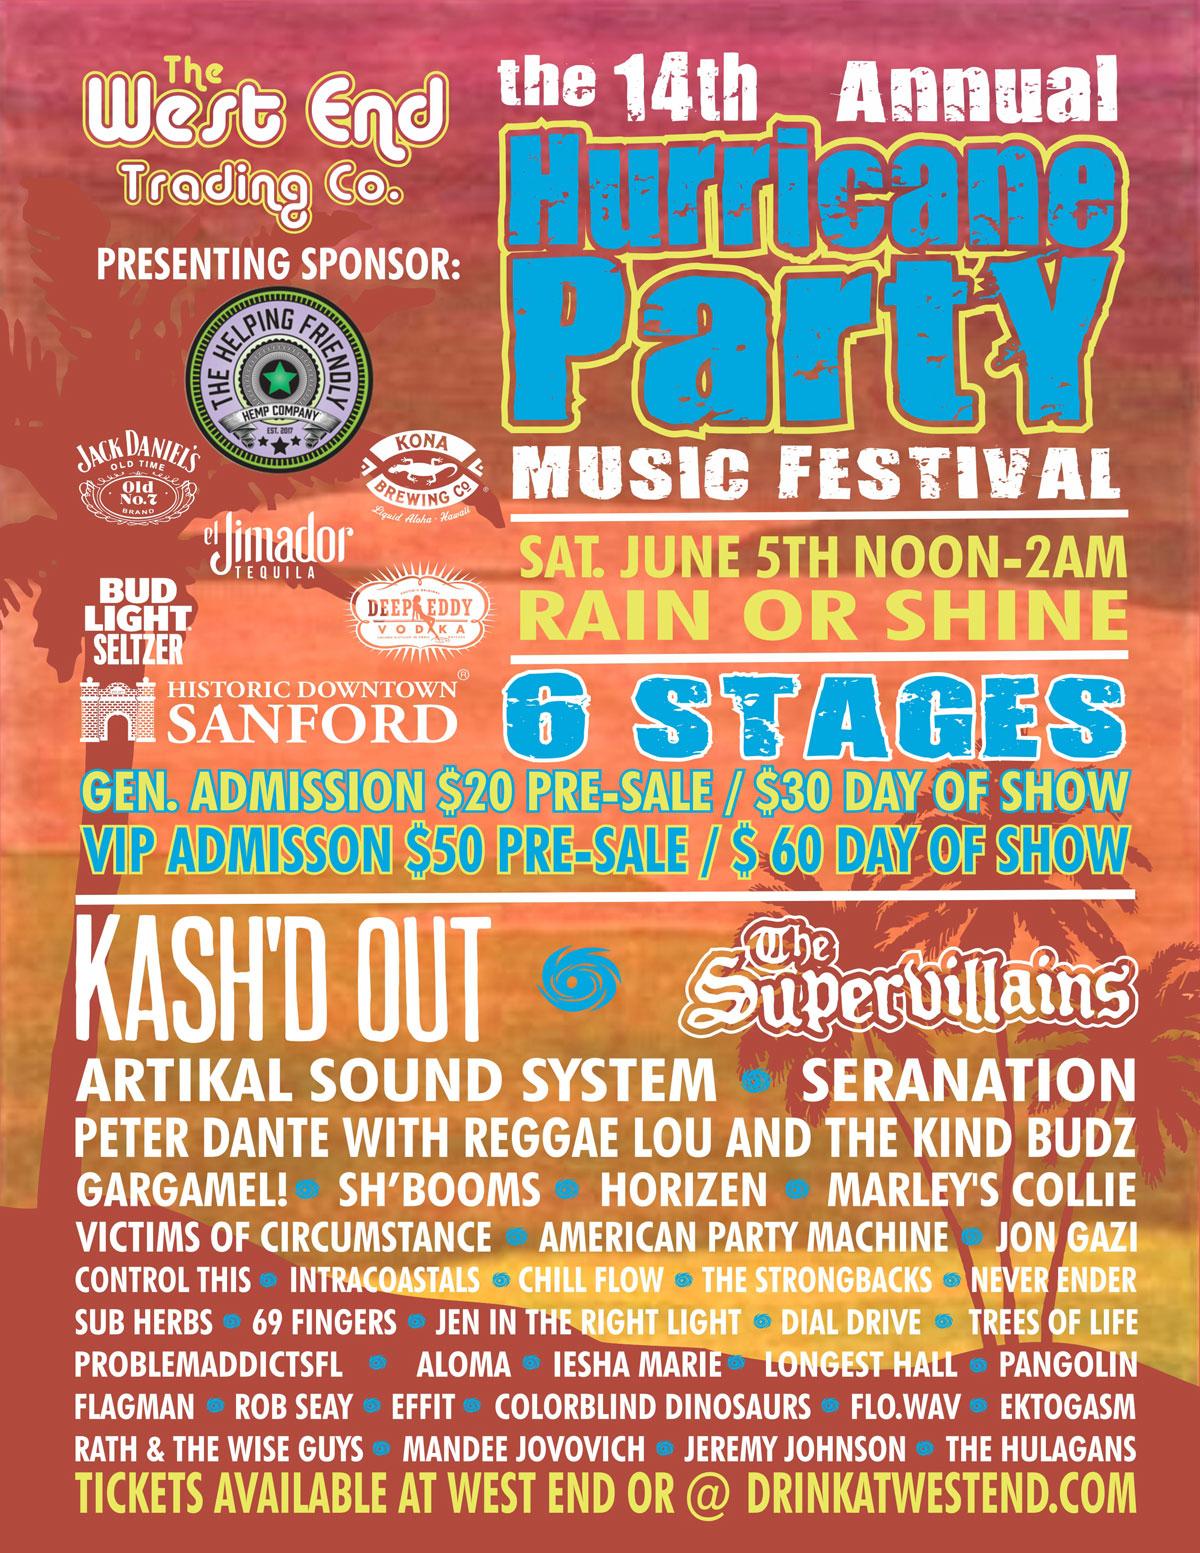 14th Annual Hurricane Party Music Festival